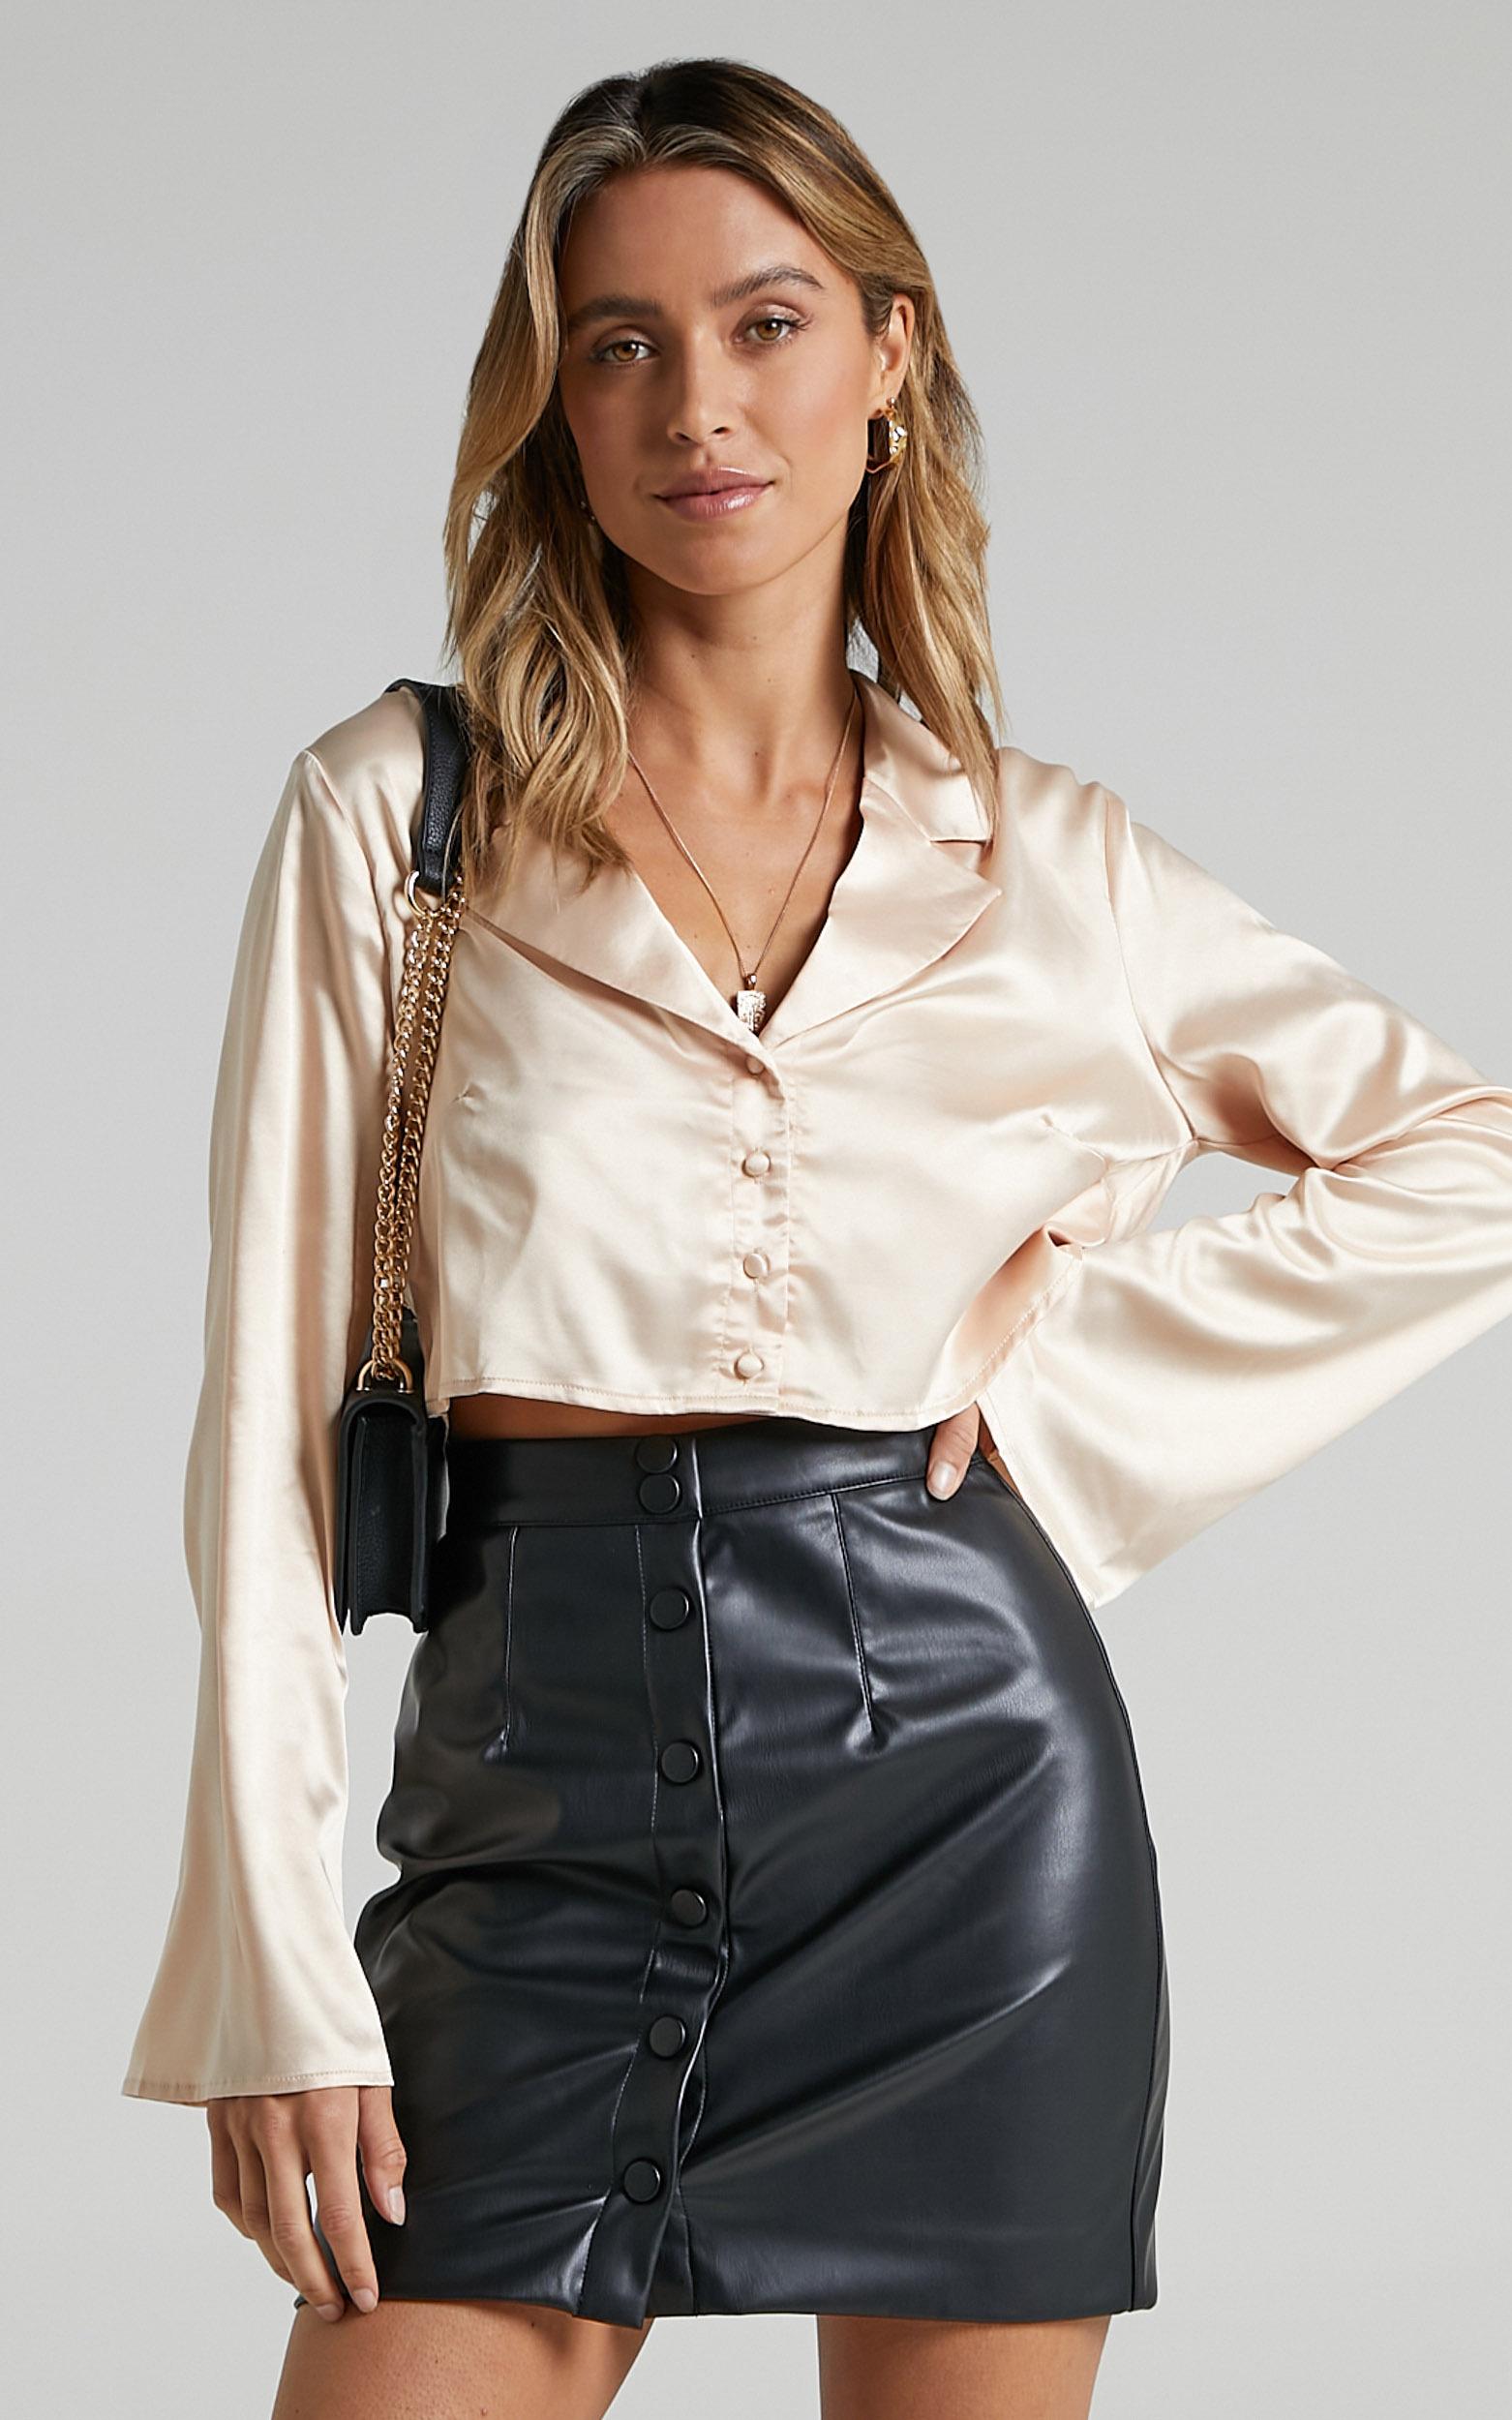 Lucille Leatherette Mini Skirt in Black - 06, BLK1, hi-res image number null